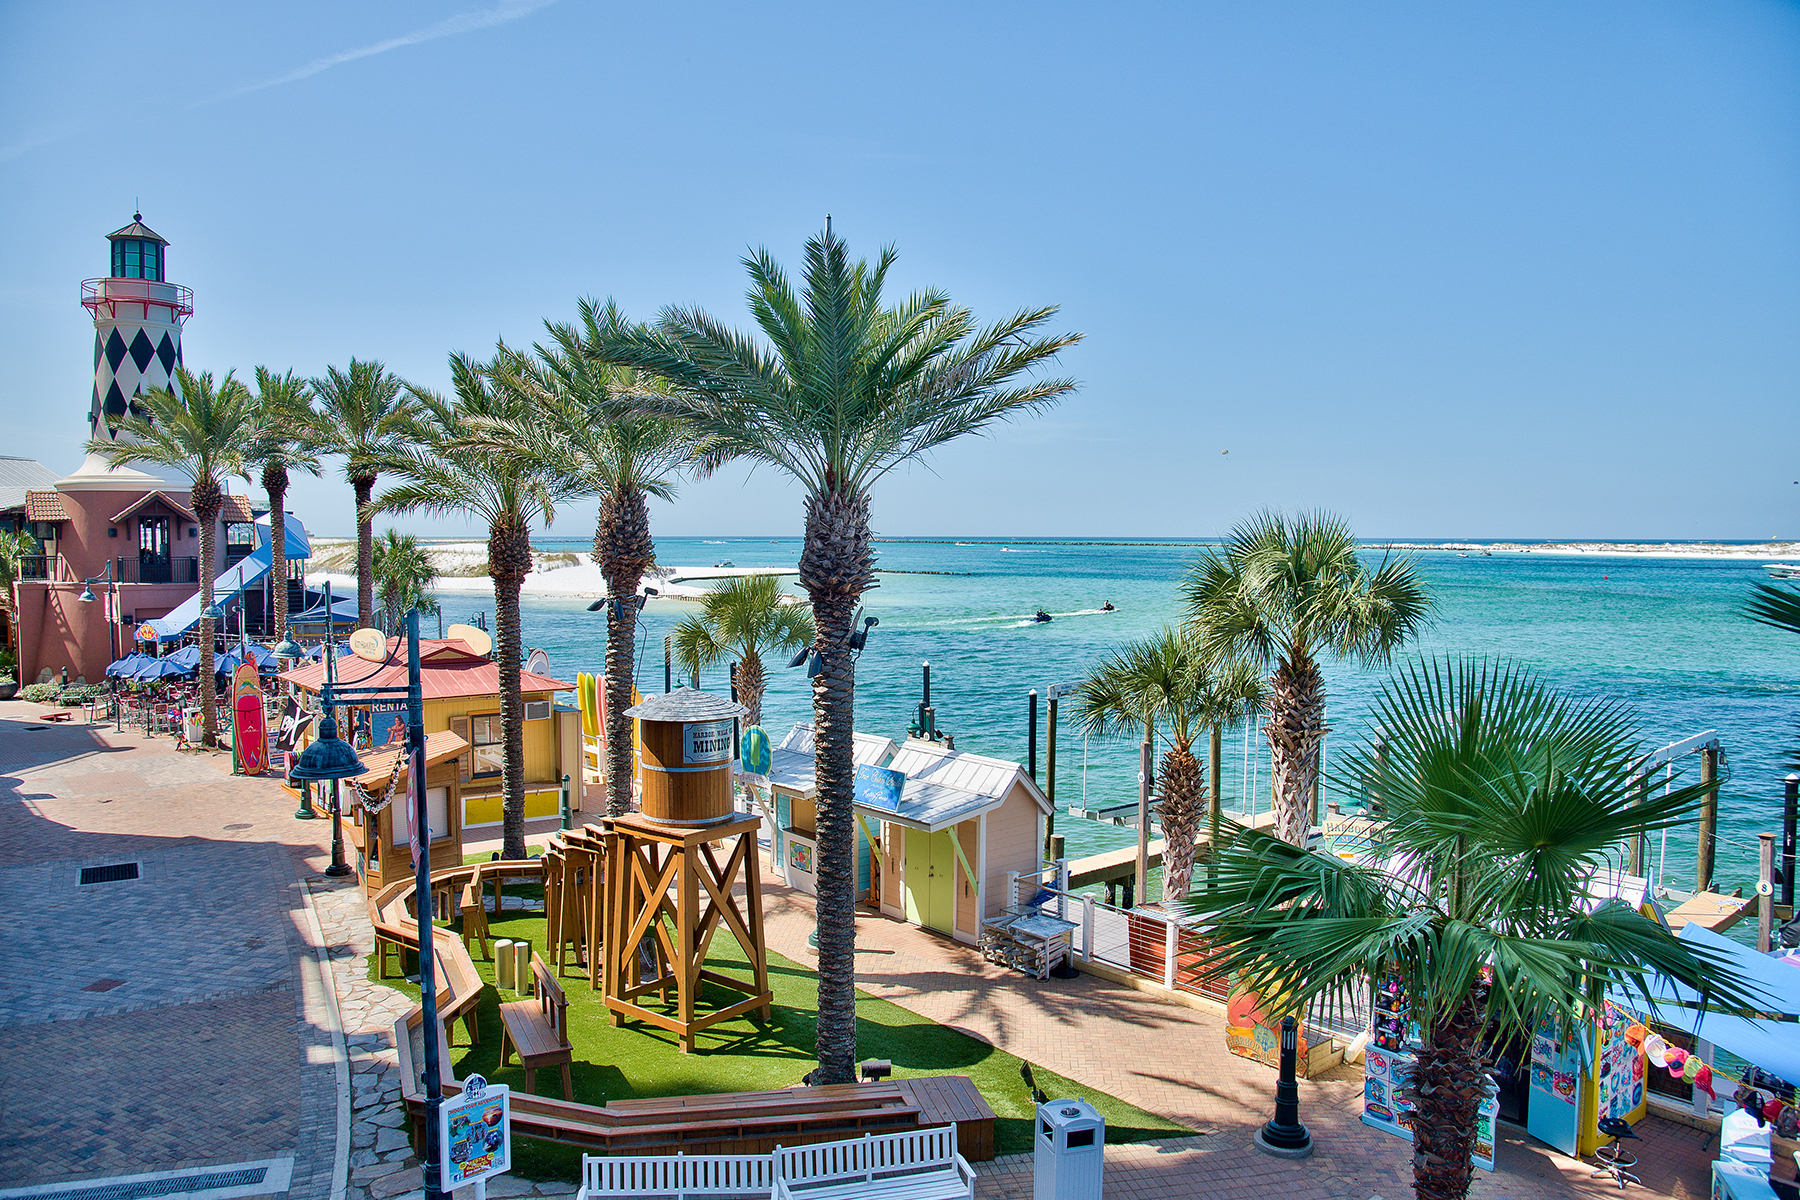 Destin Florida Condos And Beach Homes For Sale - Map Of Destin Florida Condos